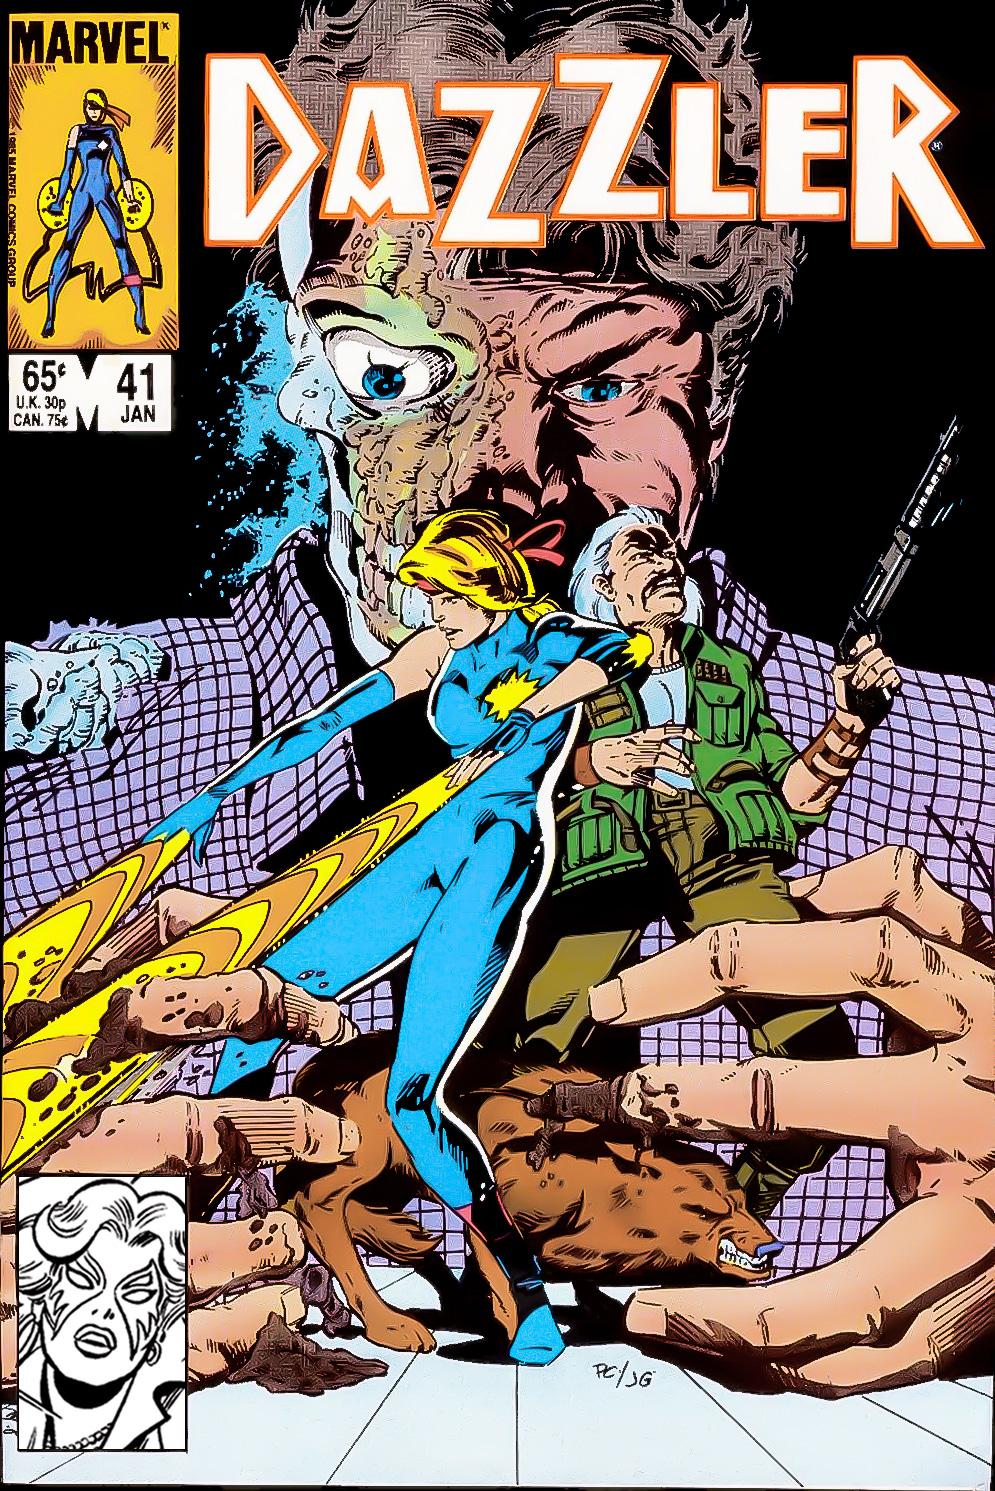 Dazzler (1981) #41